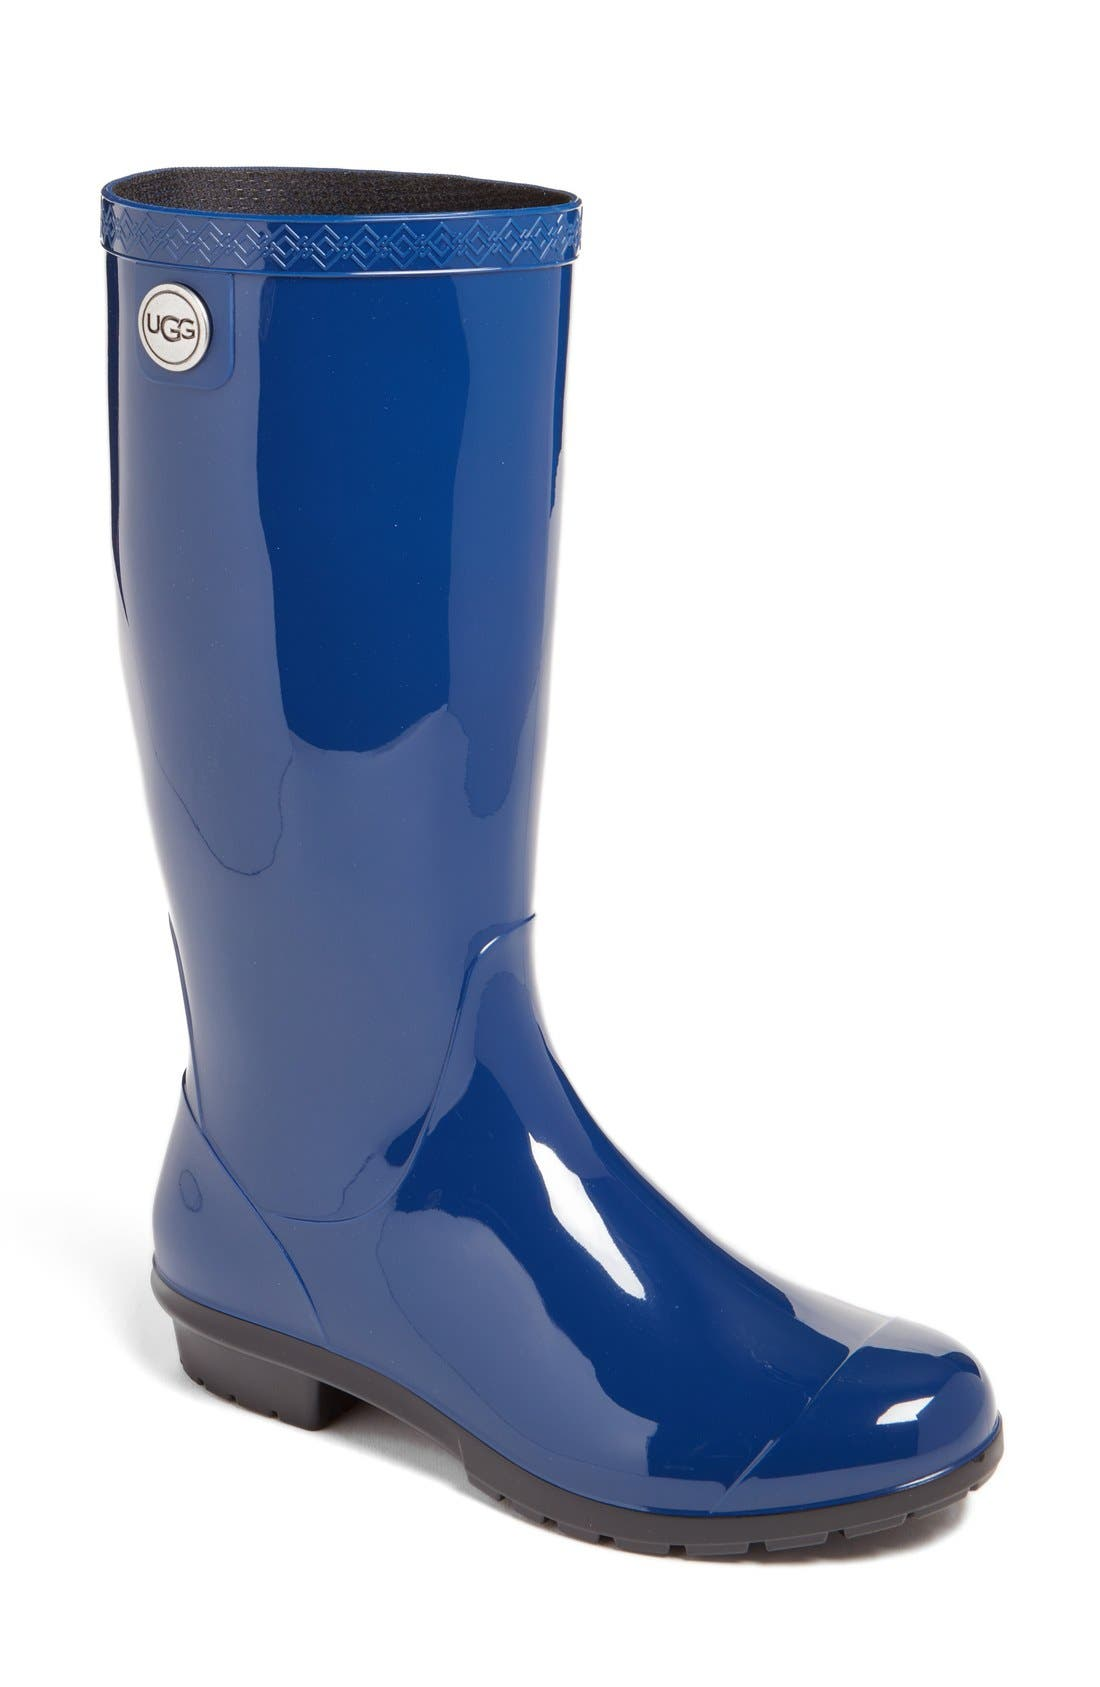 Alternate Image 1 Selected - UGG® 'Shaye' Rain Boot (Women)